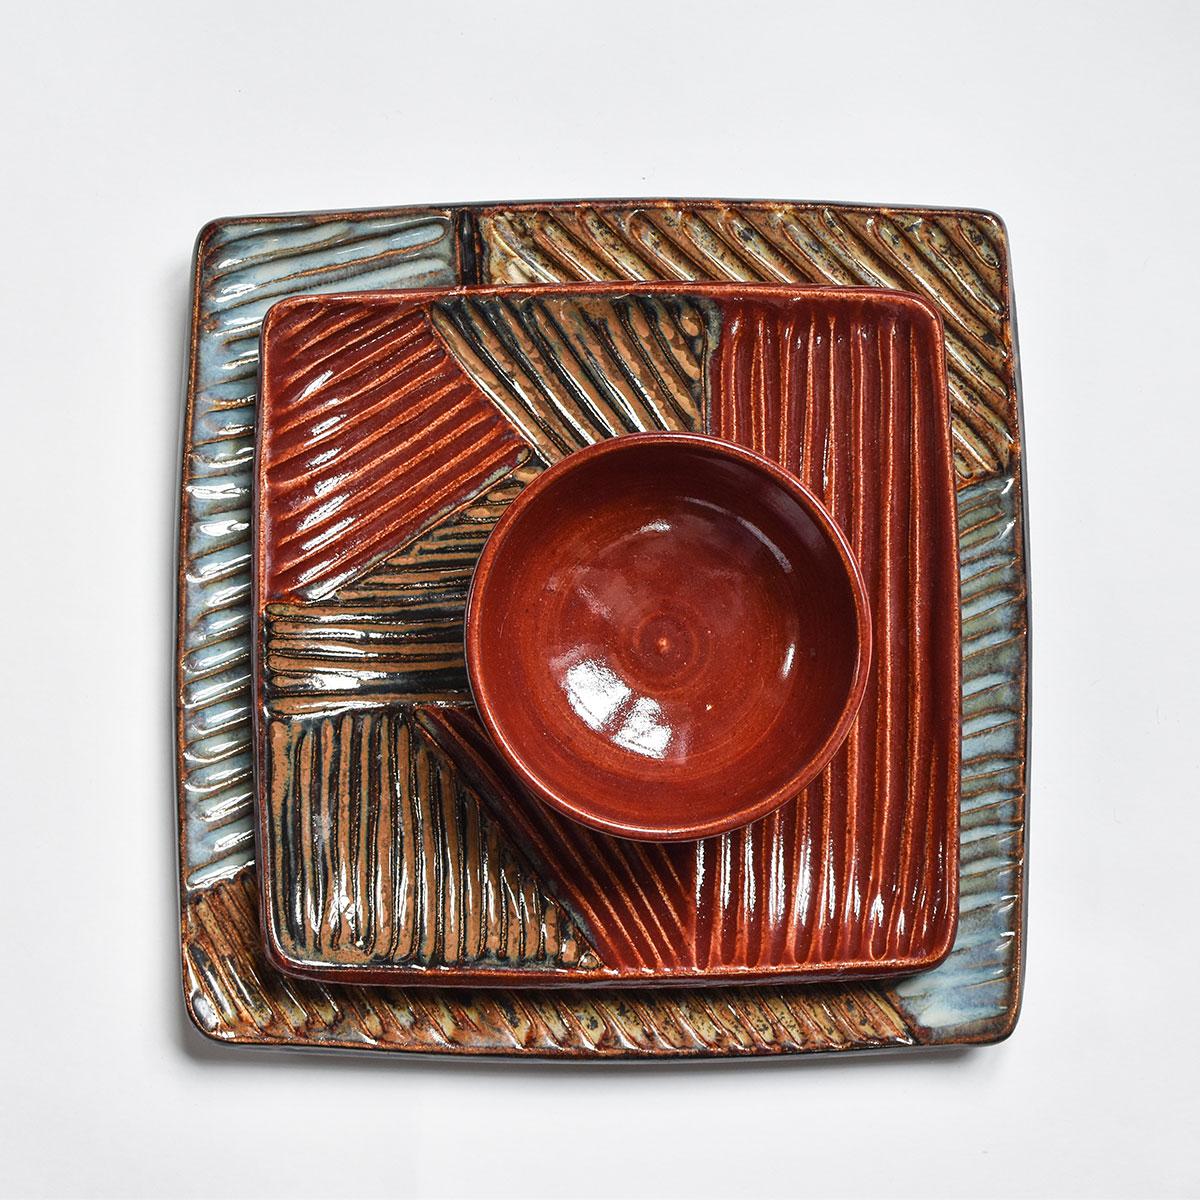 "картинка Квадратная тарелка ""Пэчворк"" красные оттенки - DishWishes.Ru"